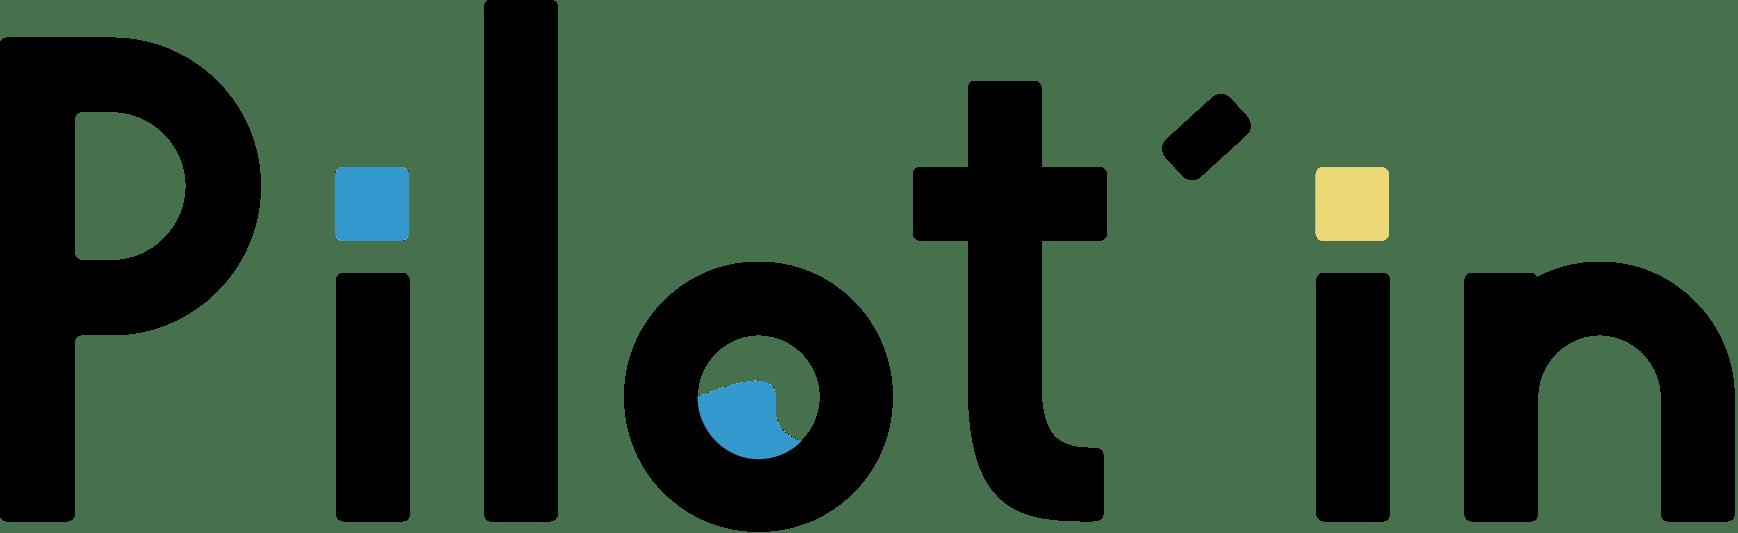 logo-pilot-in-hd-png